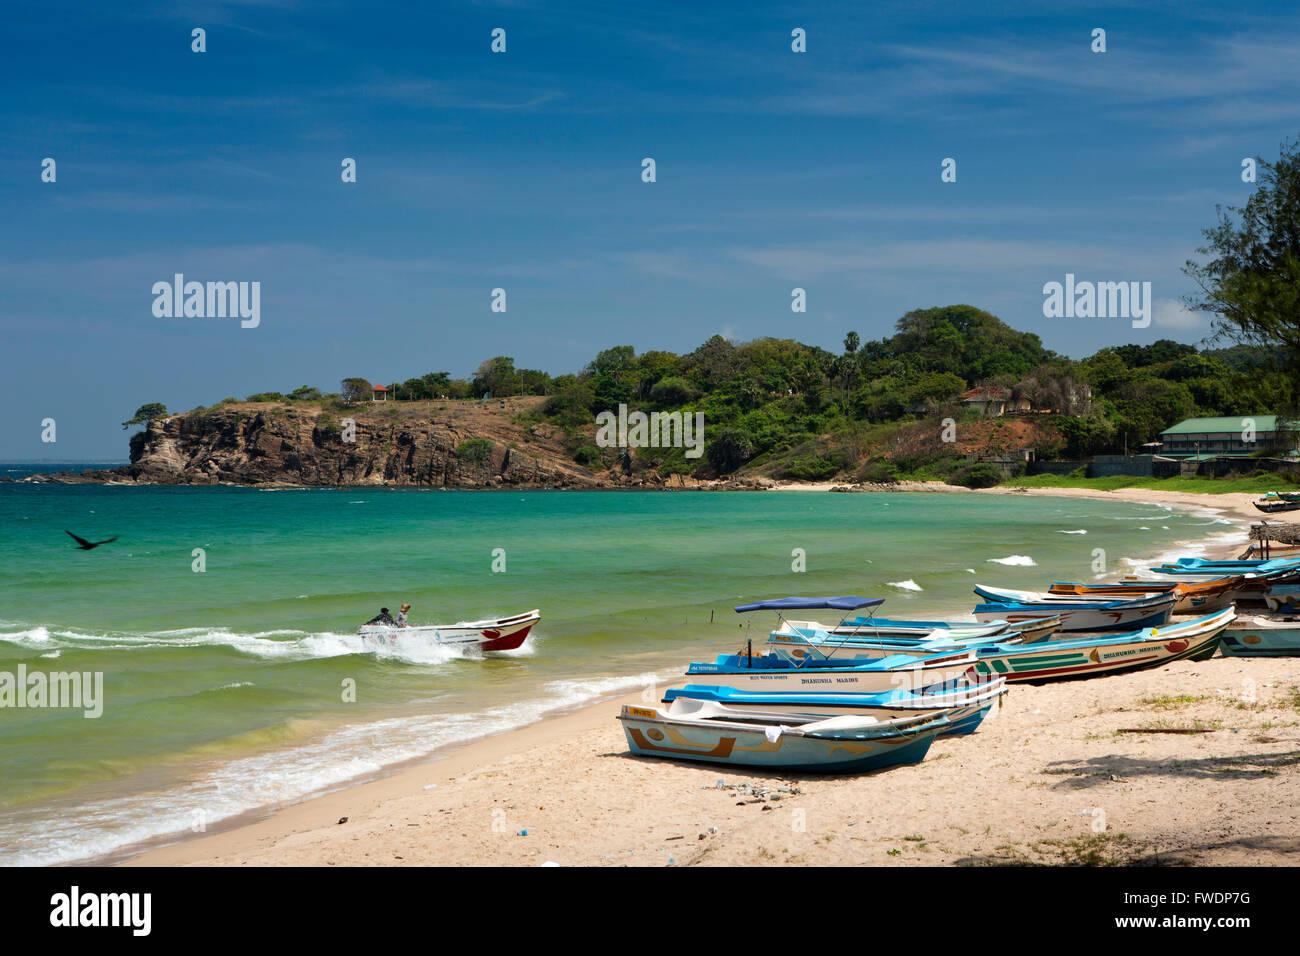 Sri Lanka, Trincomalee, Dutch Bay, fishing boats returning to the beach - Stock Image